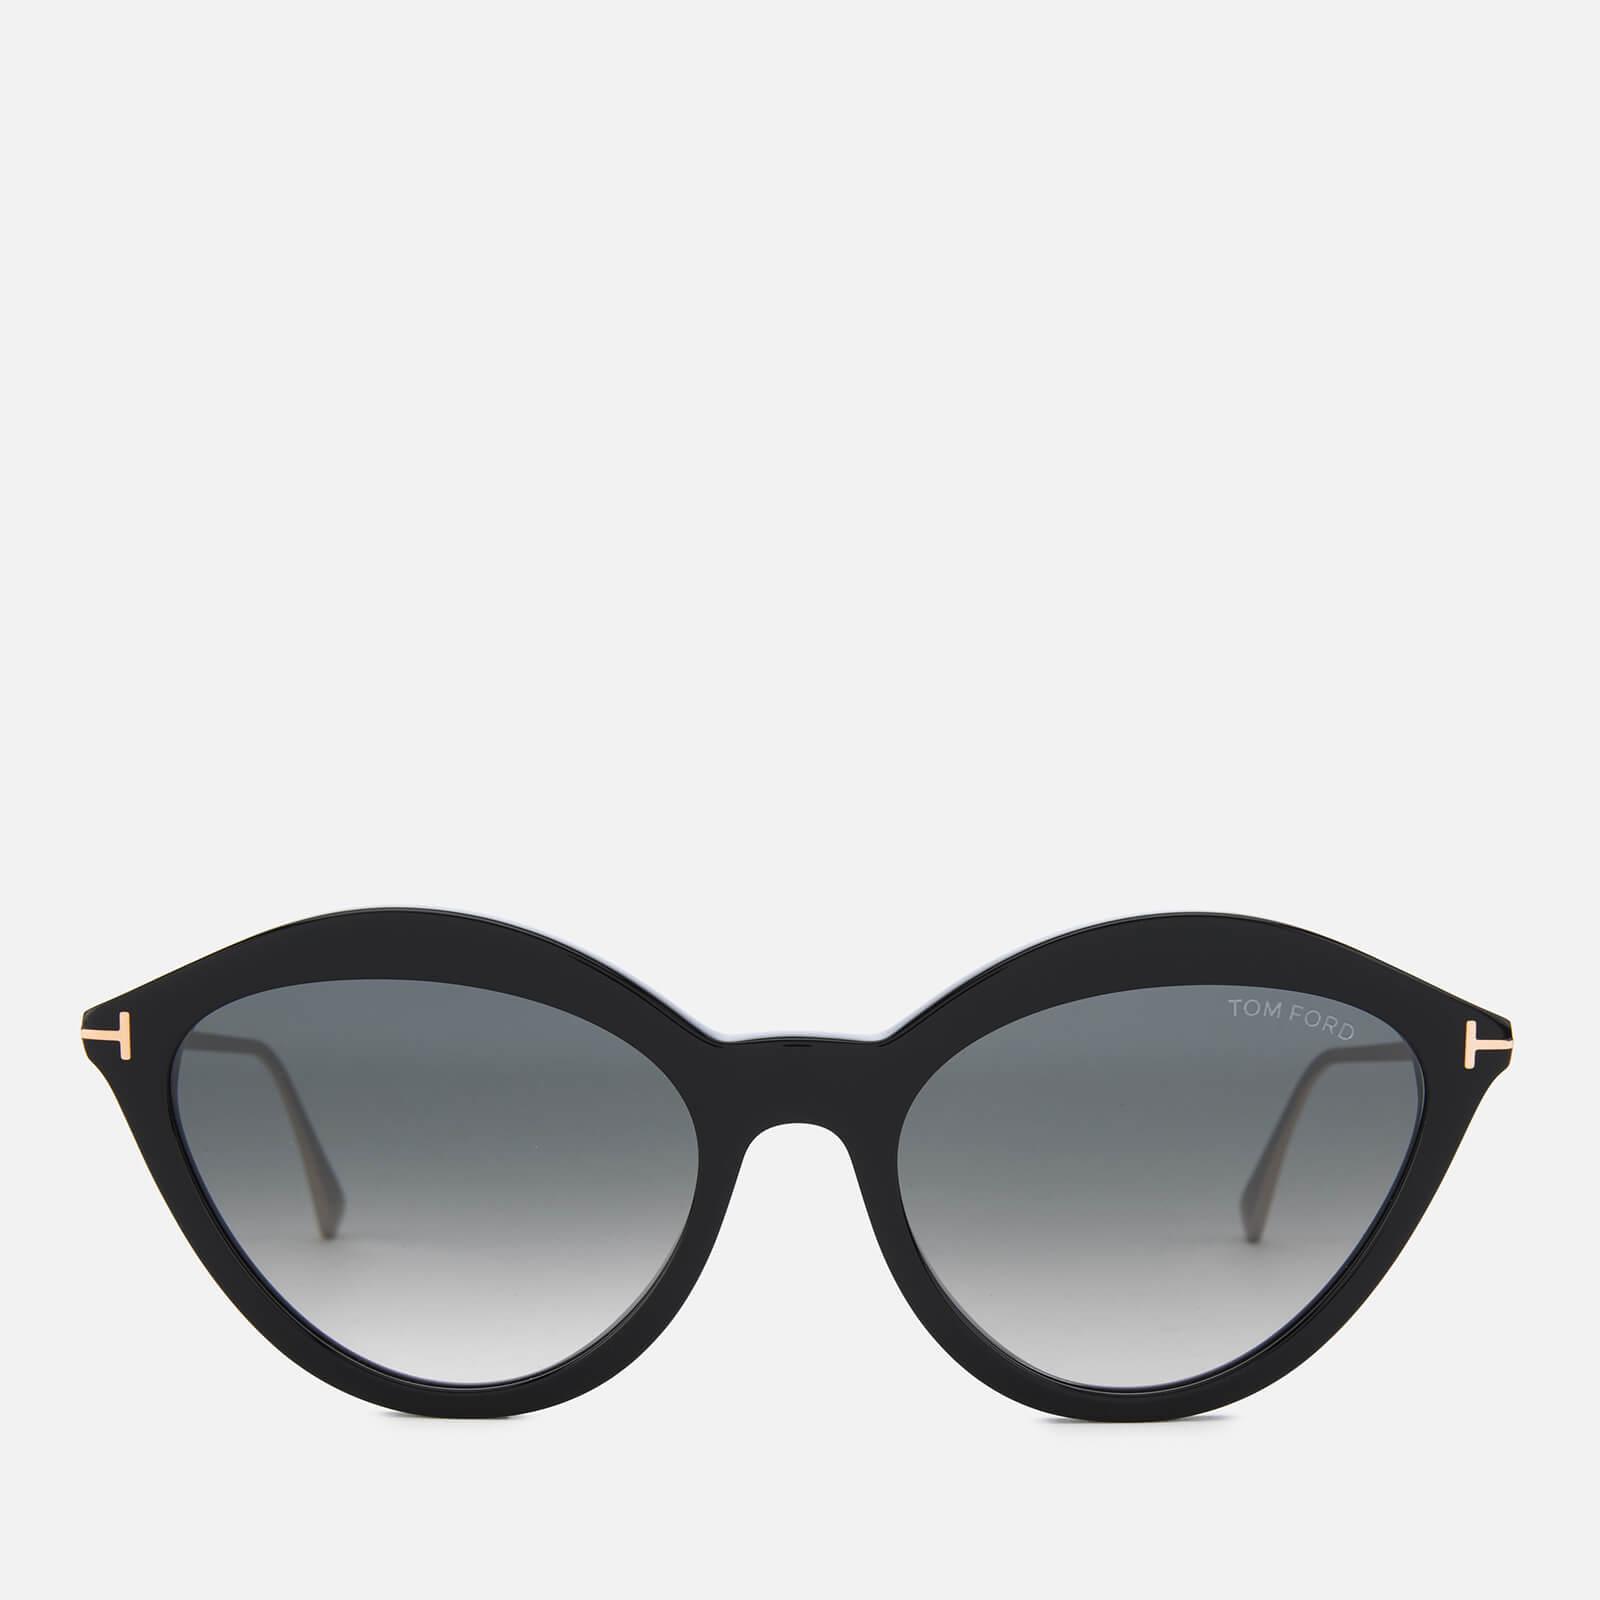 e1429086741726 Tom Ford Women s Chloe Sunglasses - Black Smoke Womens Accessories ...